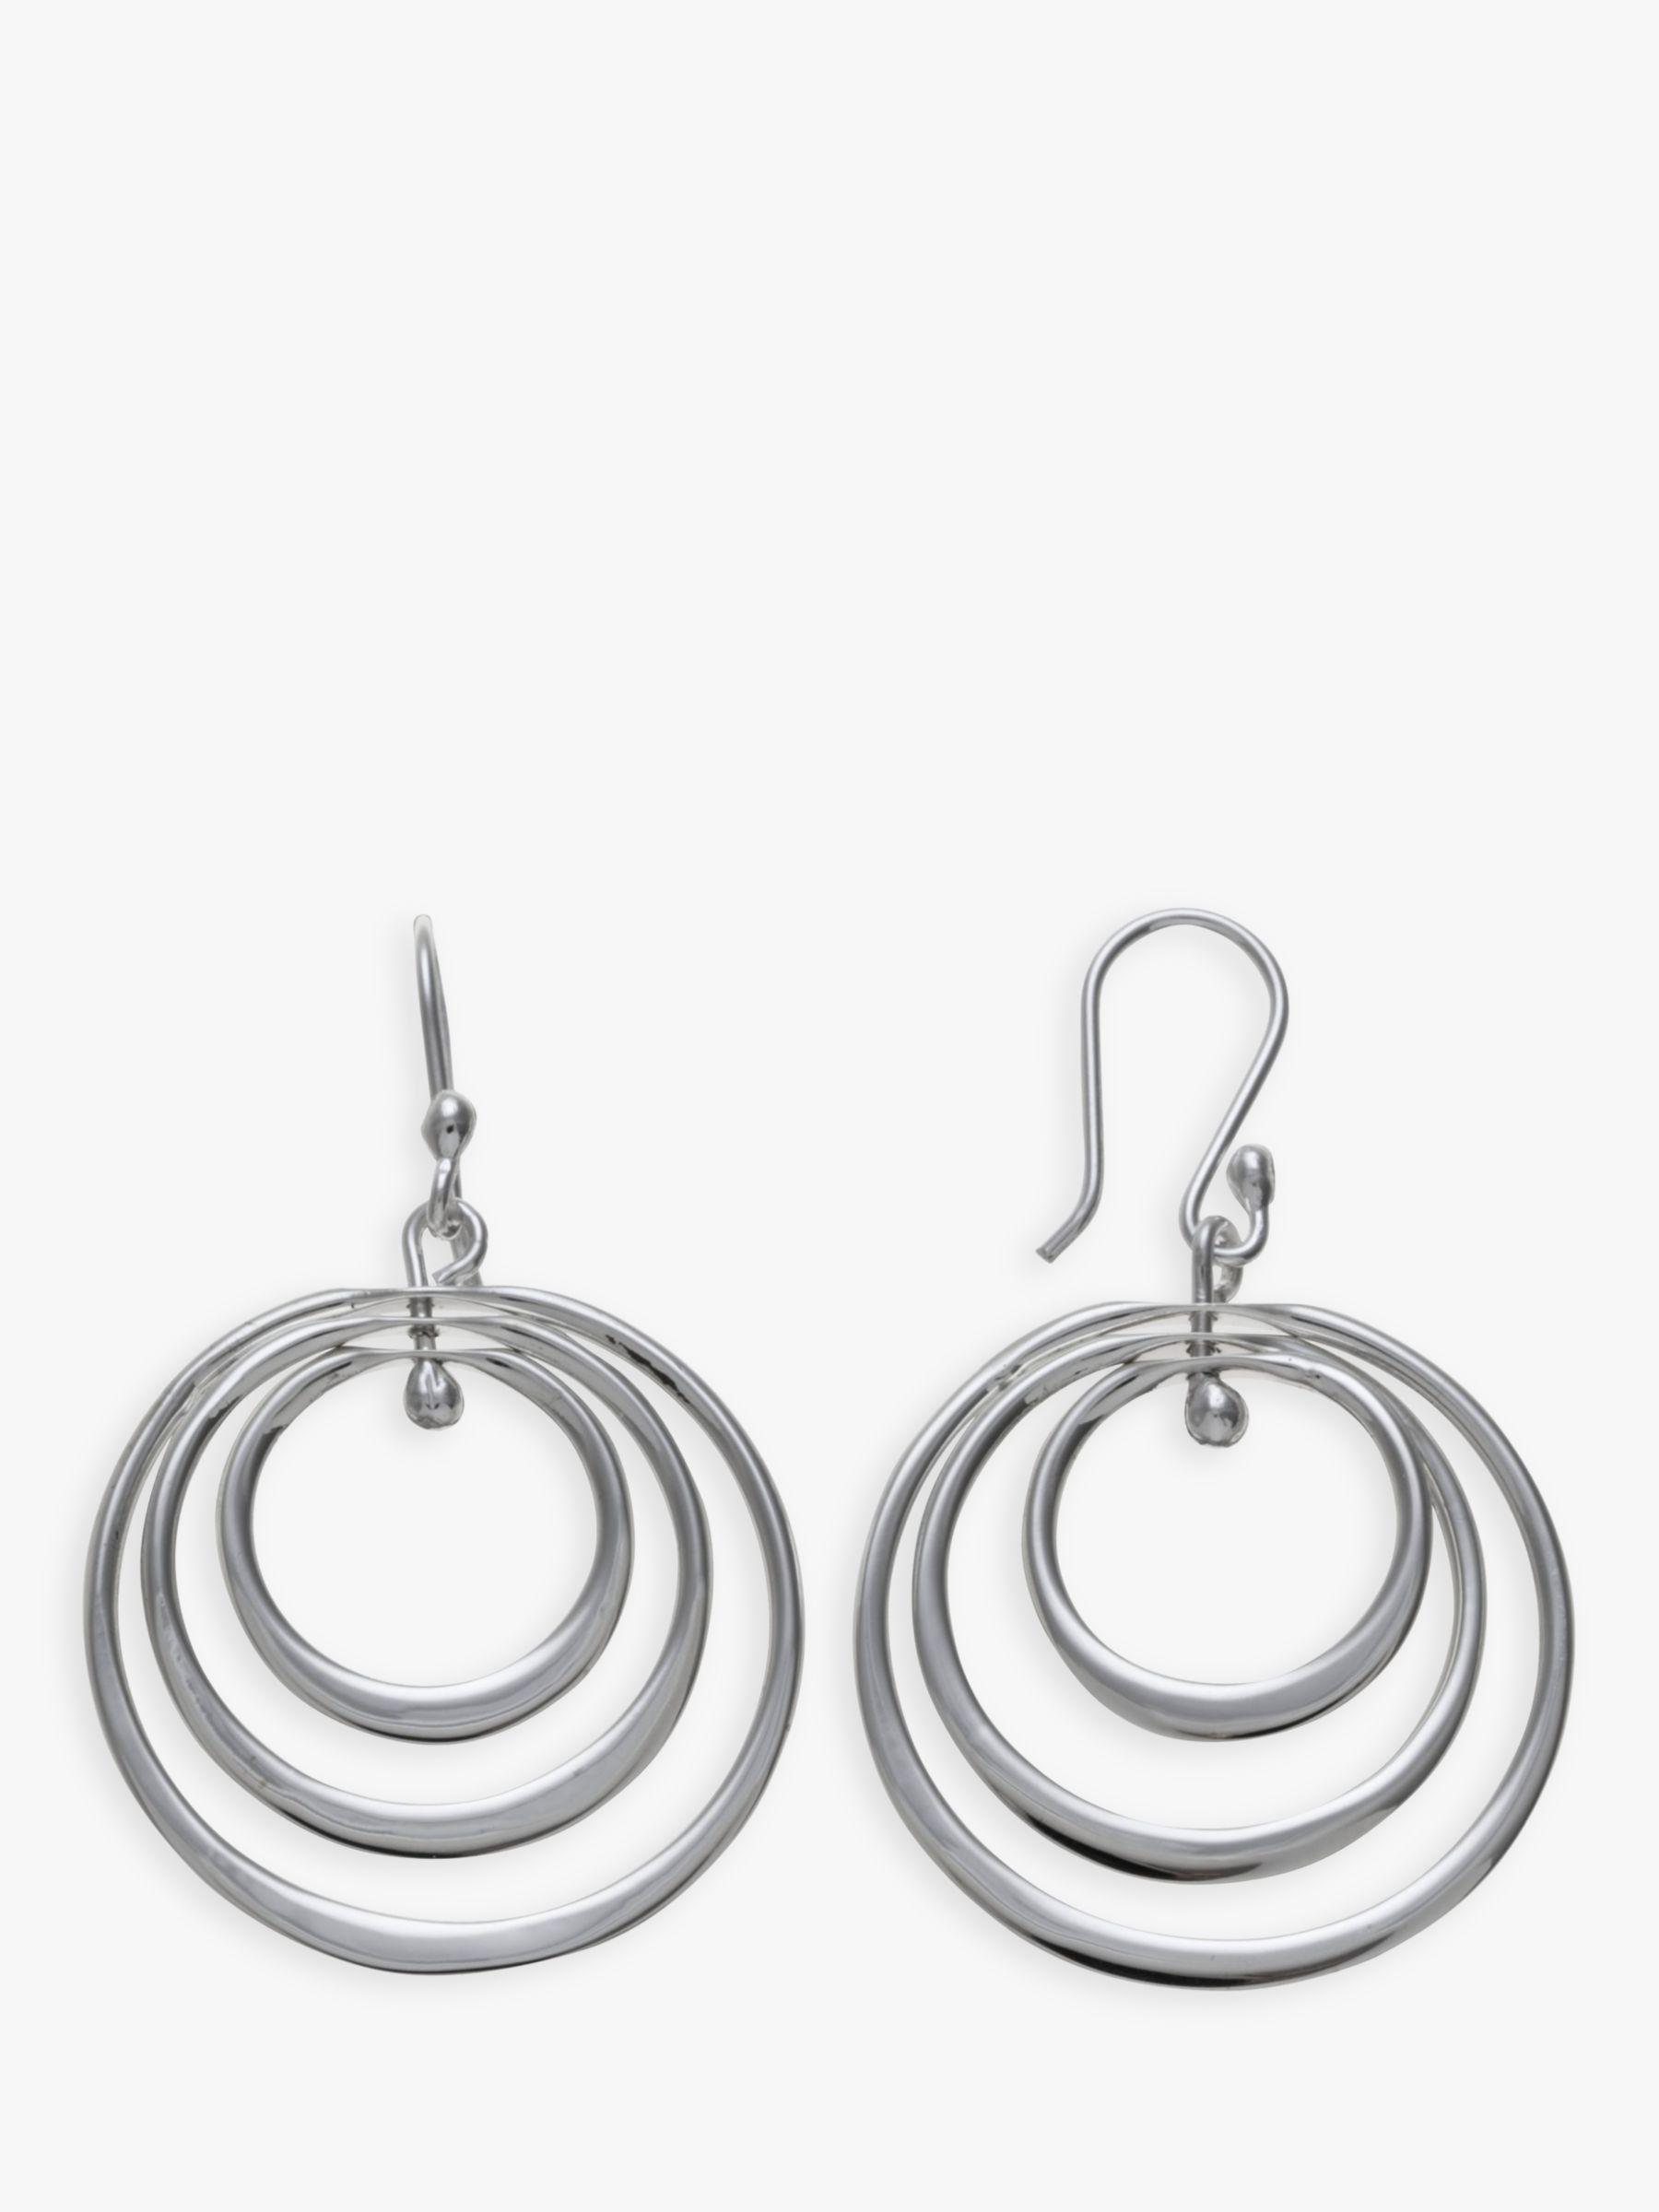 Andea Andea Sterling Silver Spinning Hoop Drop Earrings, Silver